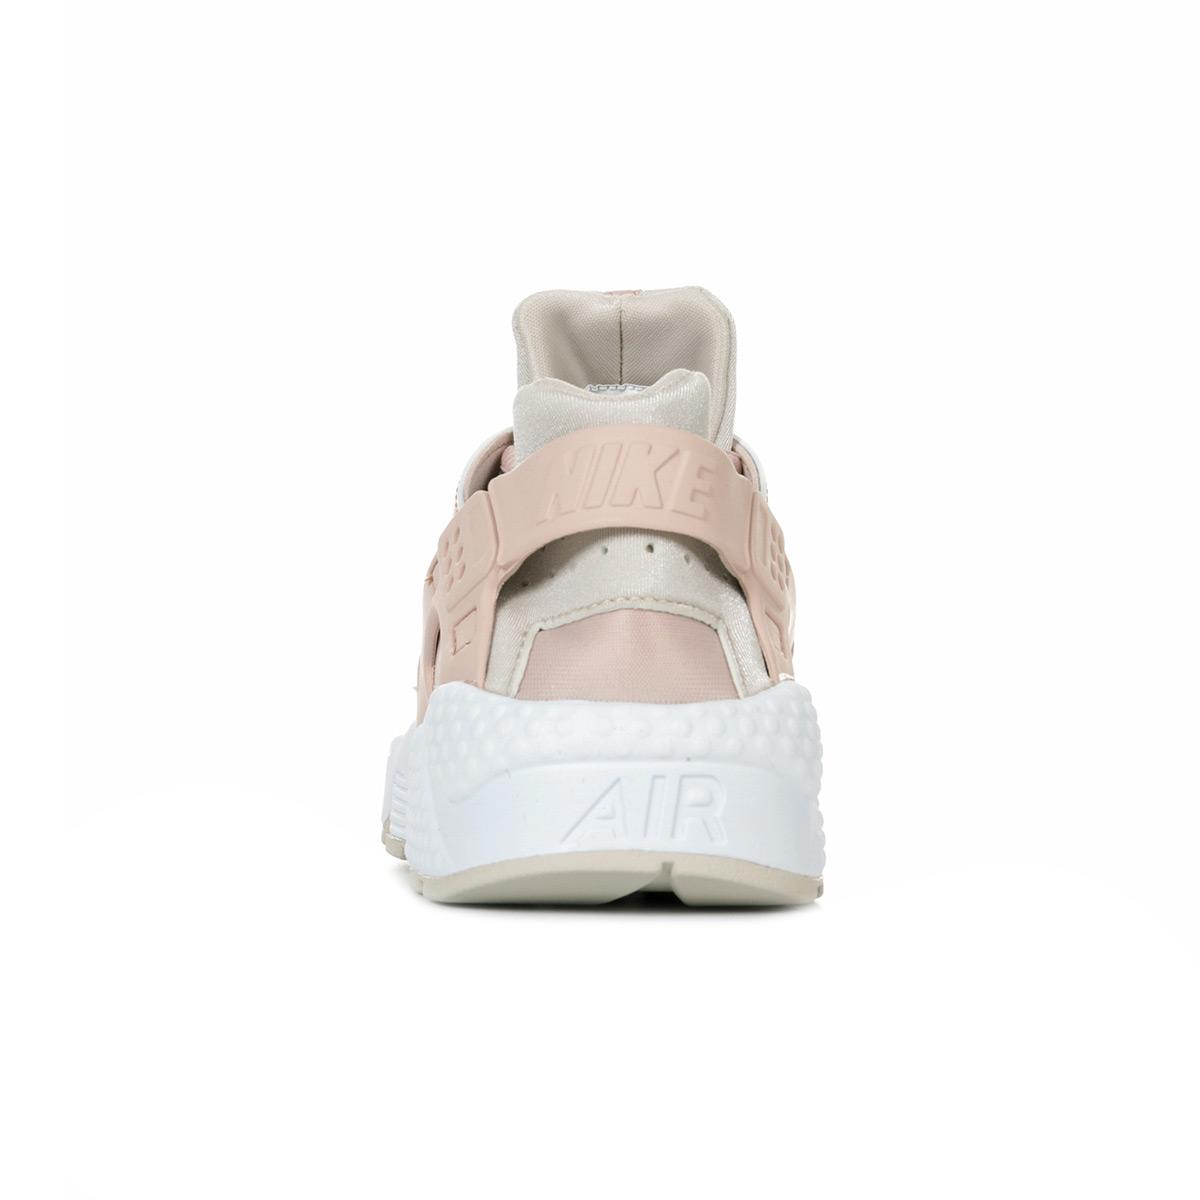 2e6f256c3d09 Détails sur Chaussures Baskets Nike femme Wn s Air Huarache Run